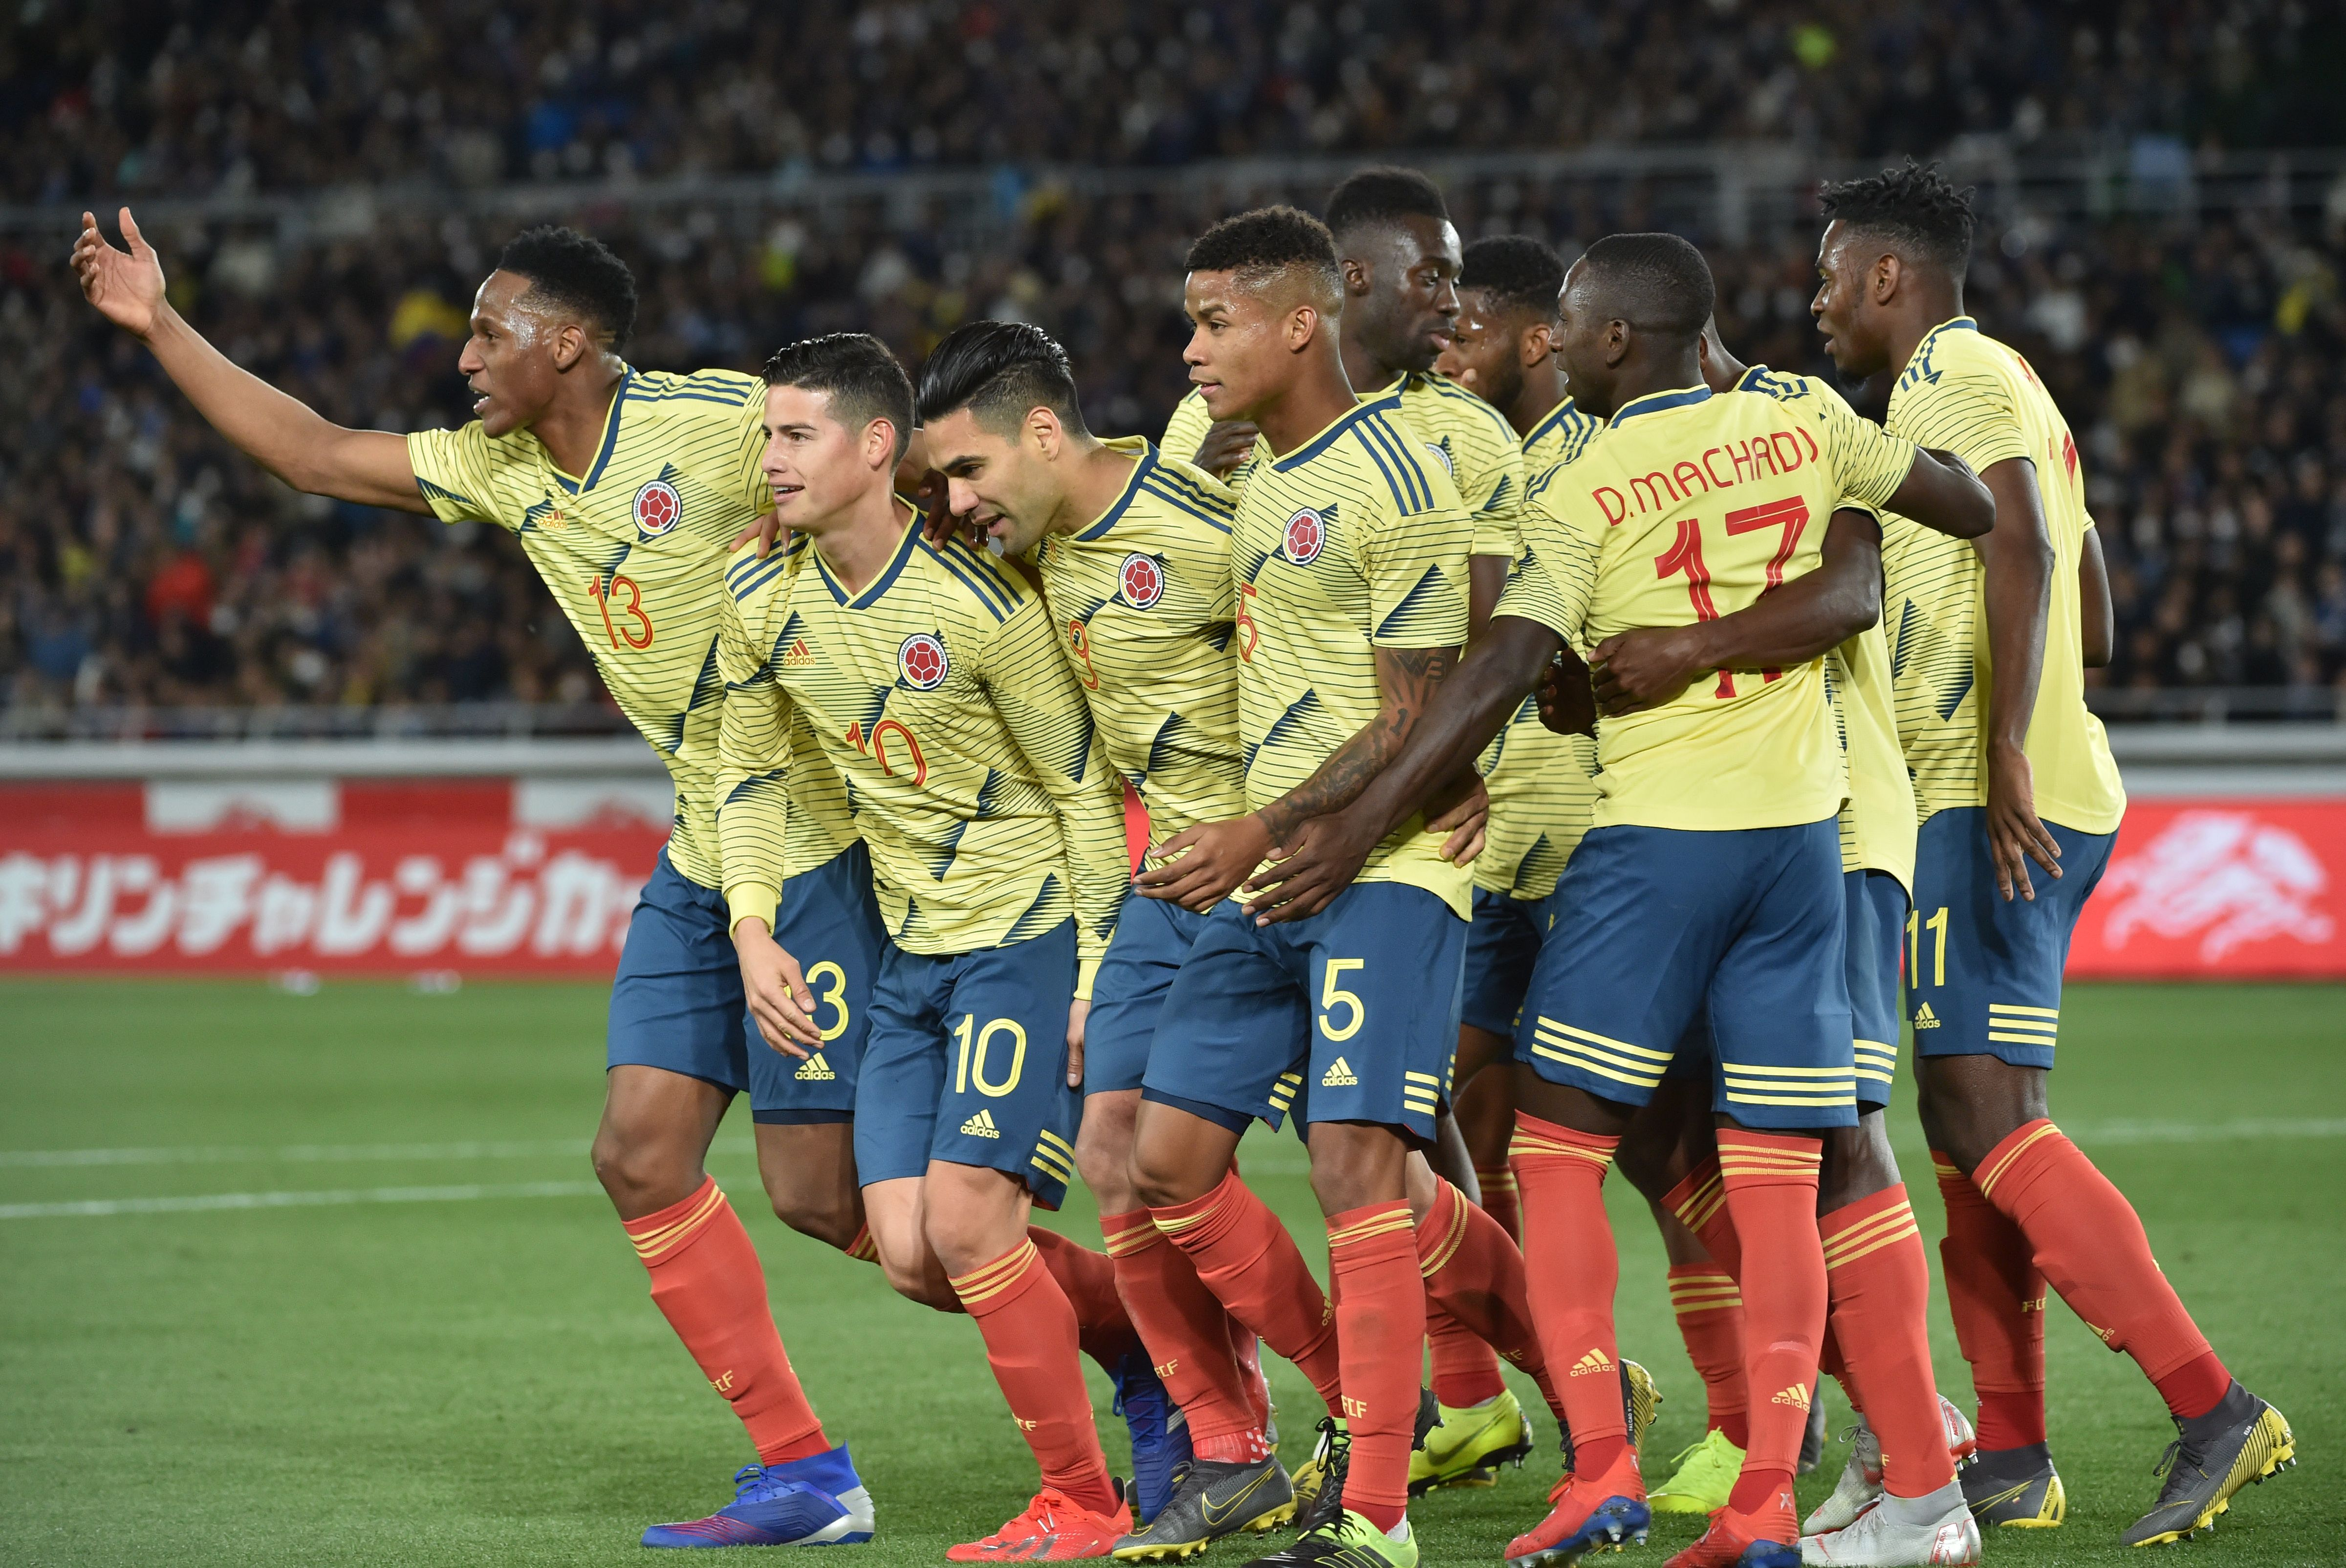 Colombia gol vs Japon 2019